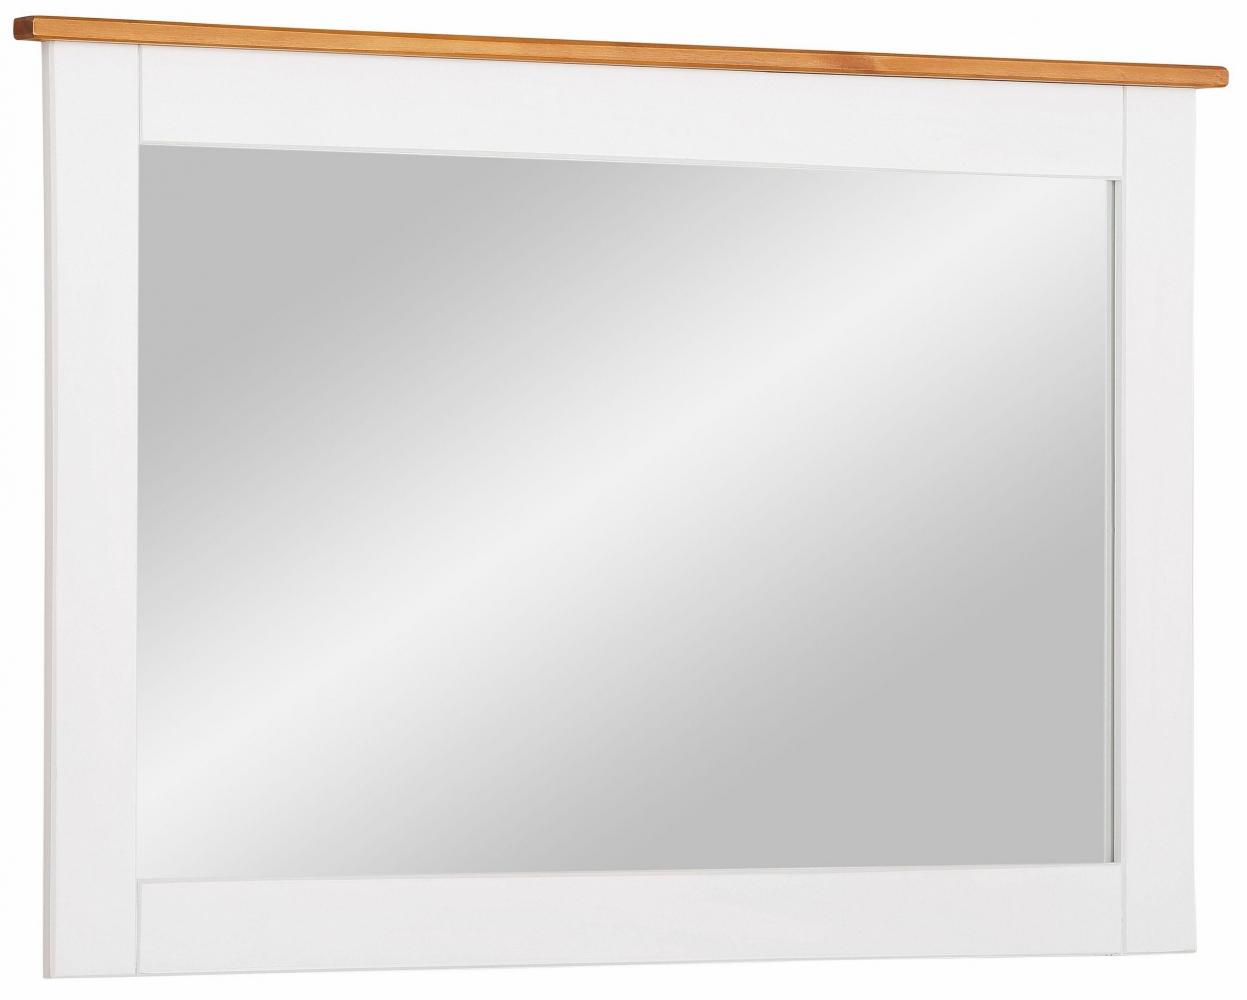 Nástěnné zrcadlo Cosma, 90 cm, bílá